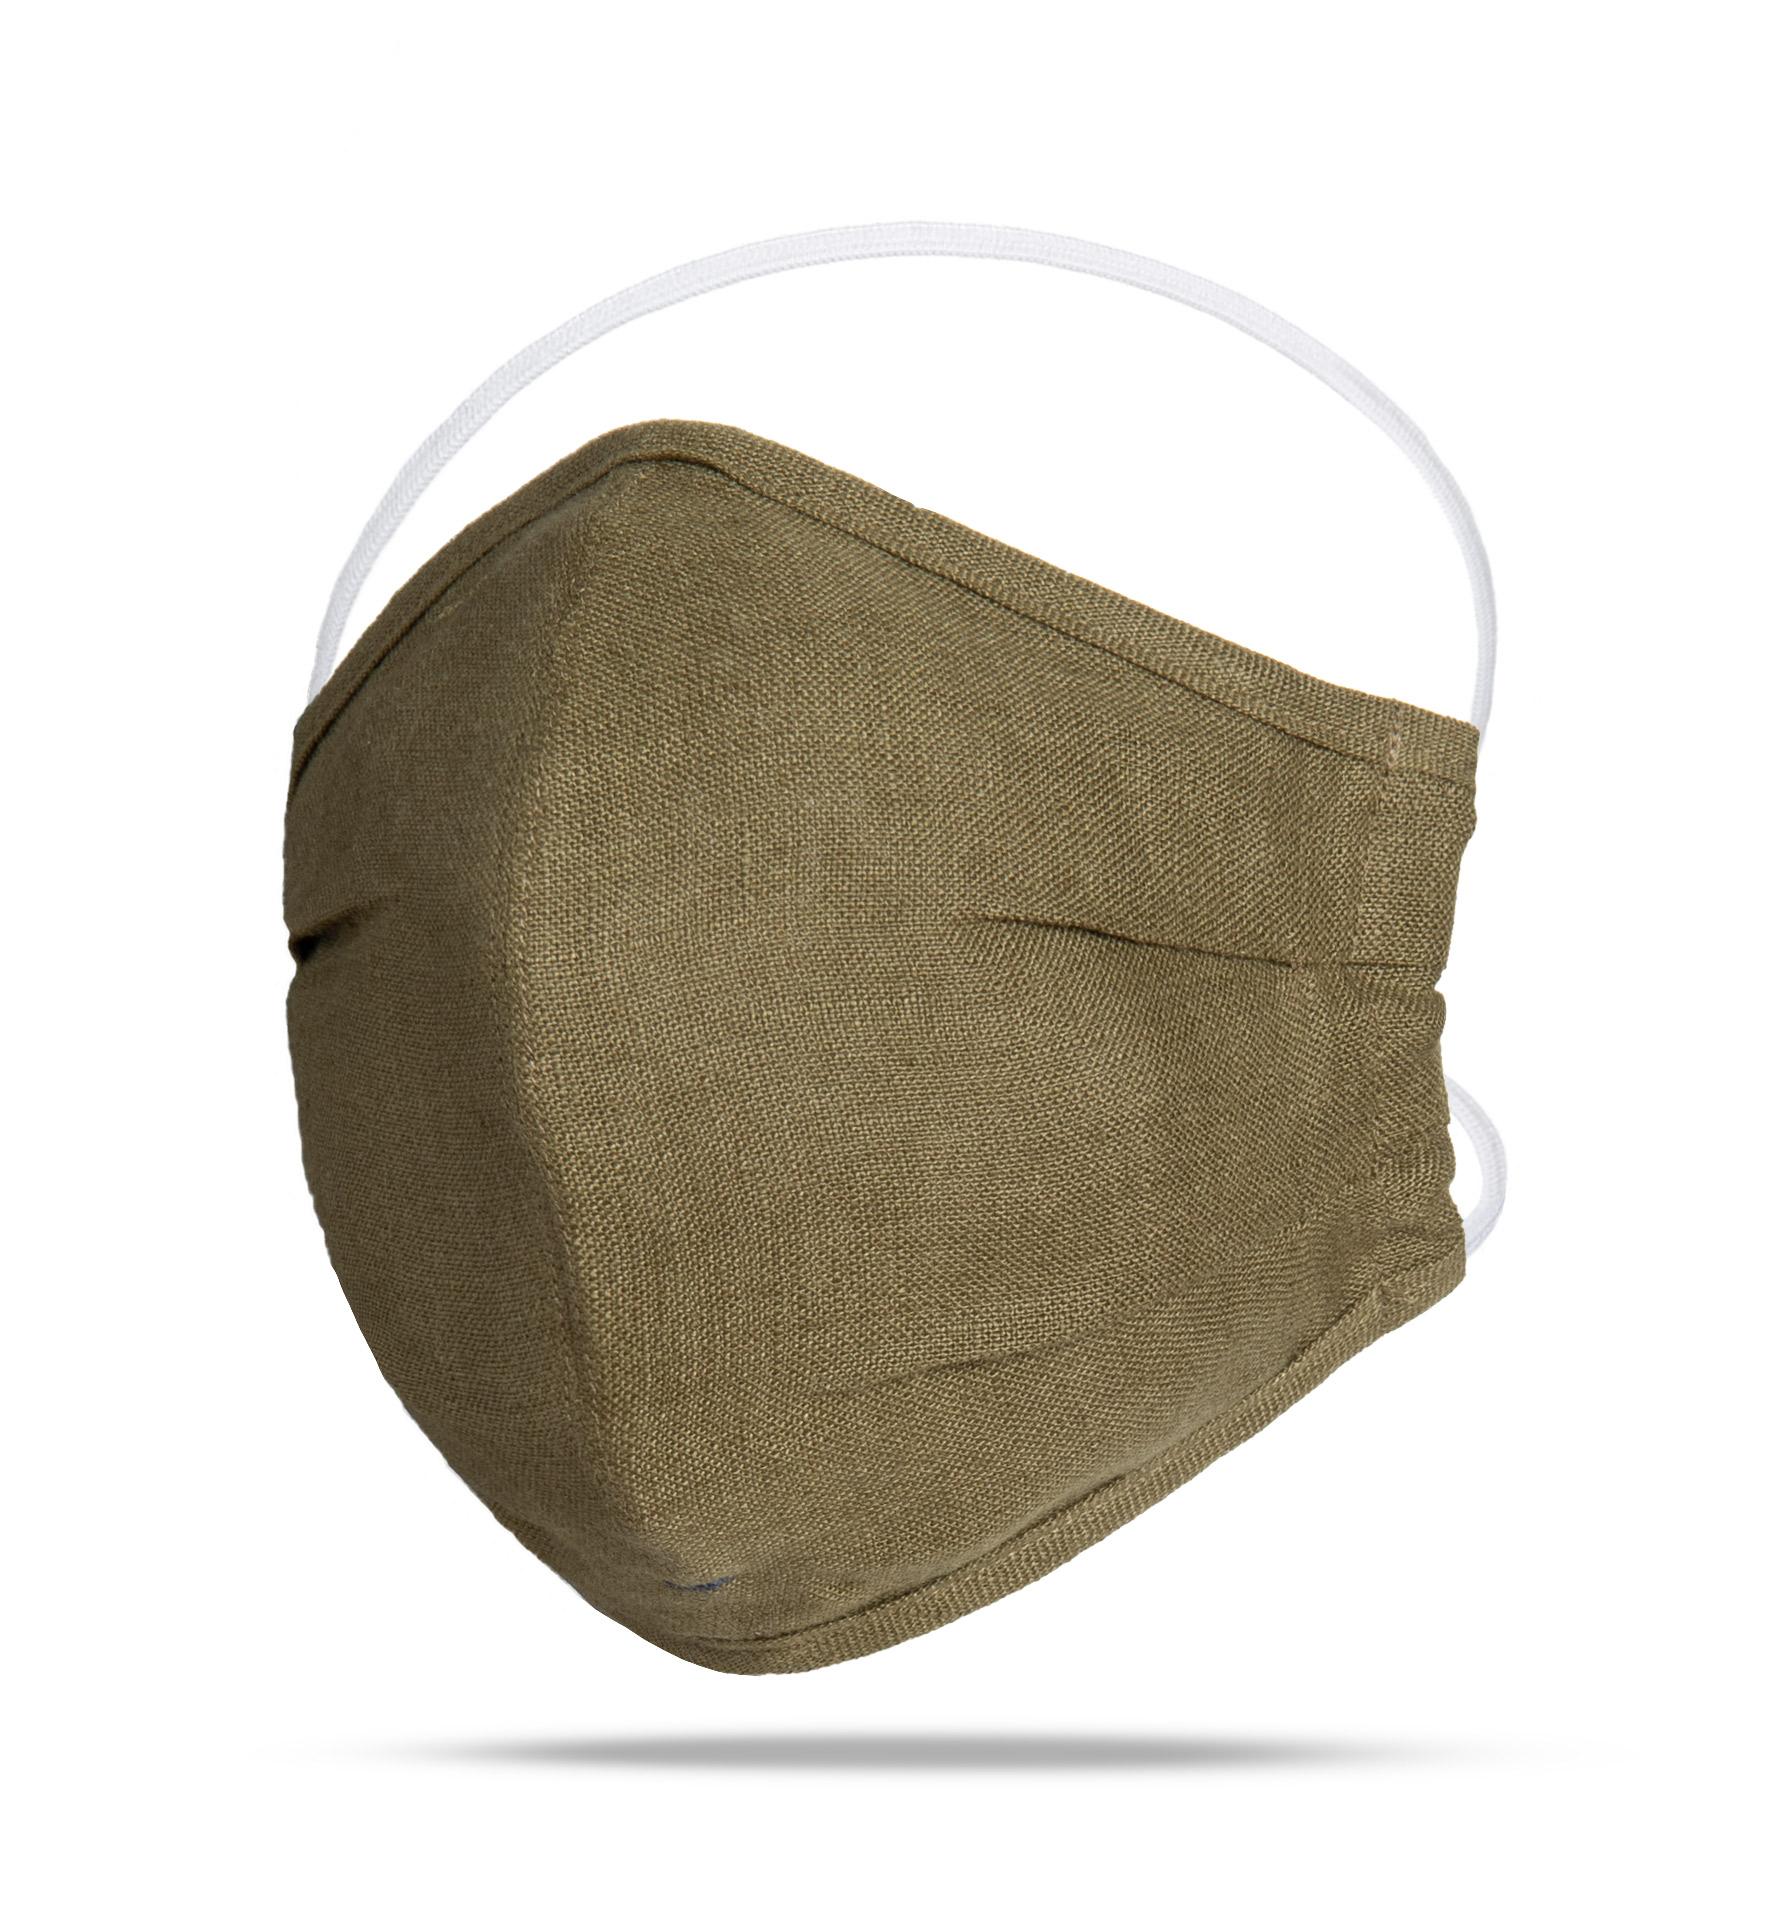 Zoom Image of The Everyday Mask v1.3 - Olive Linen (Single Mask)